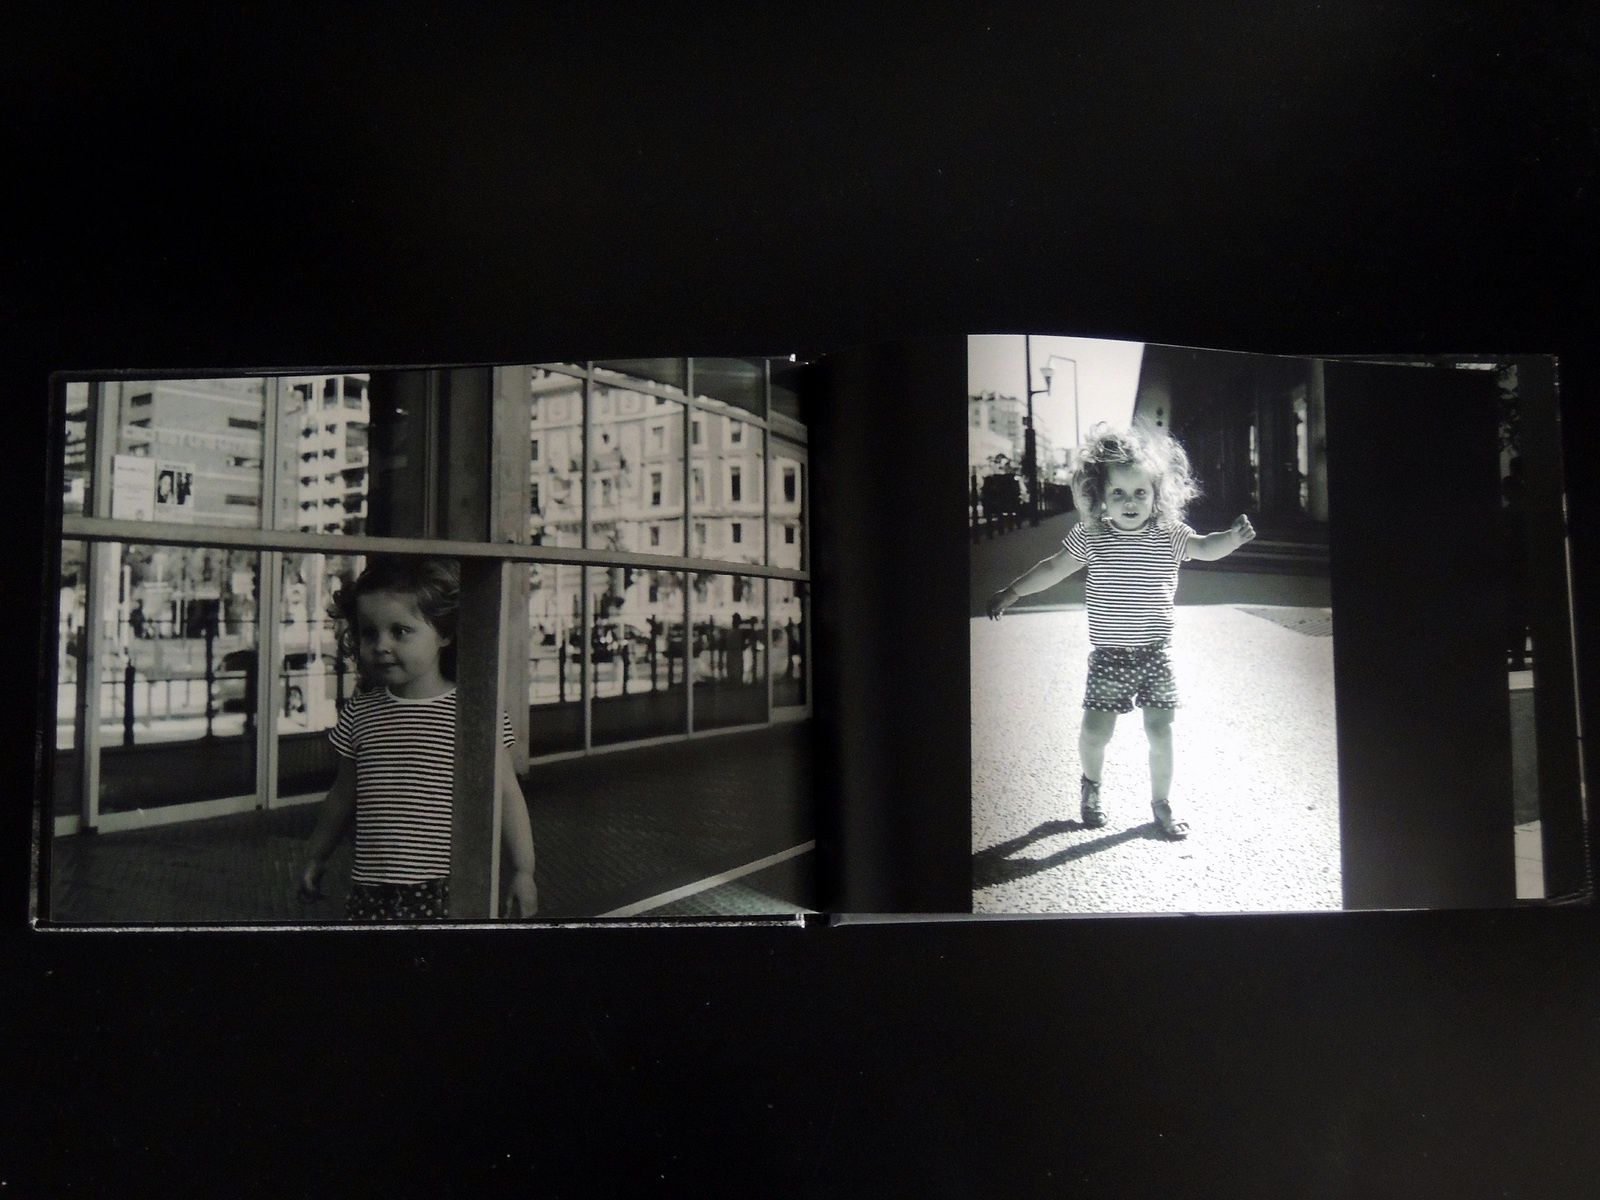 Idée kdo: Un livre photo pour Noël avec Pixalib (sponso)